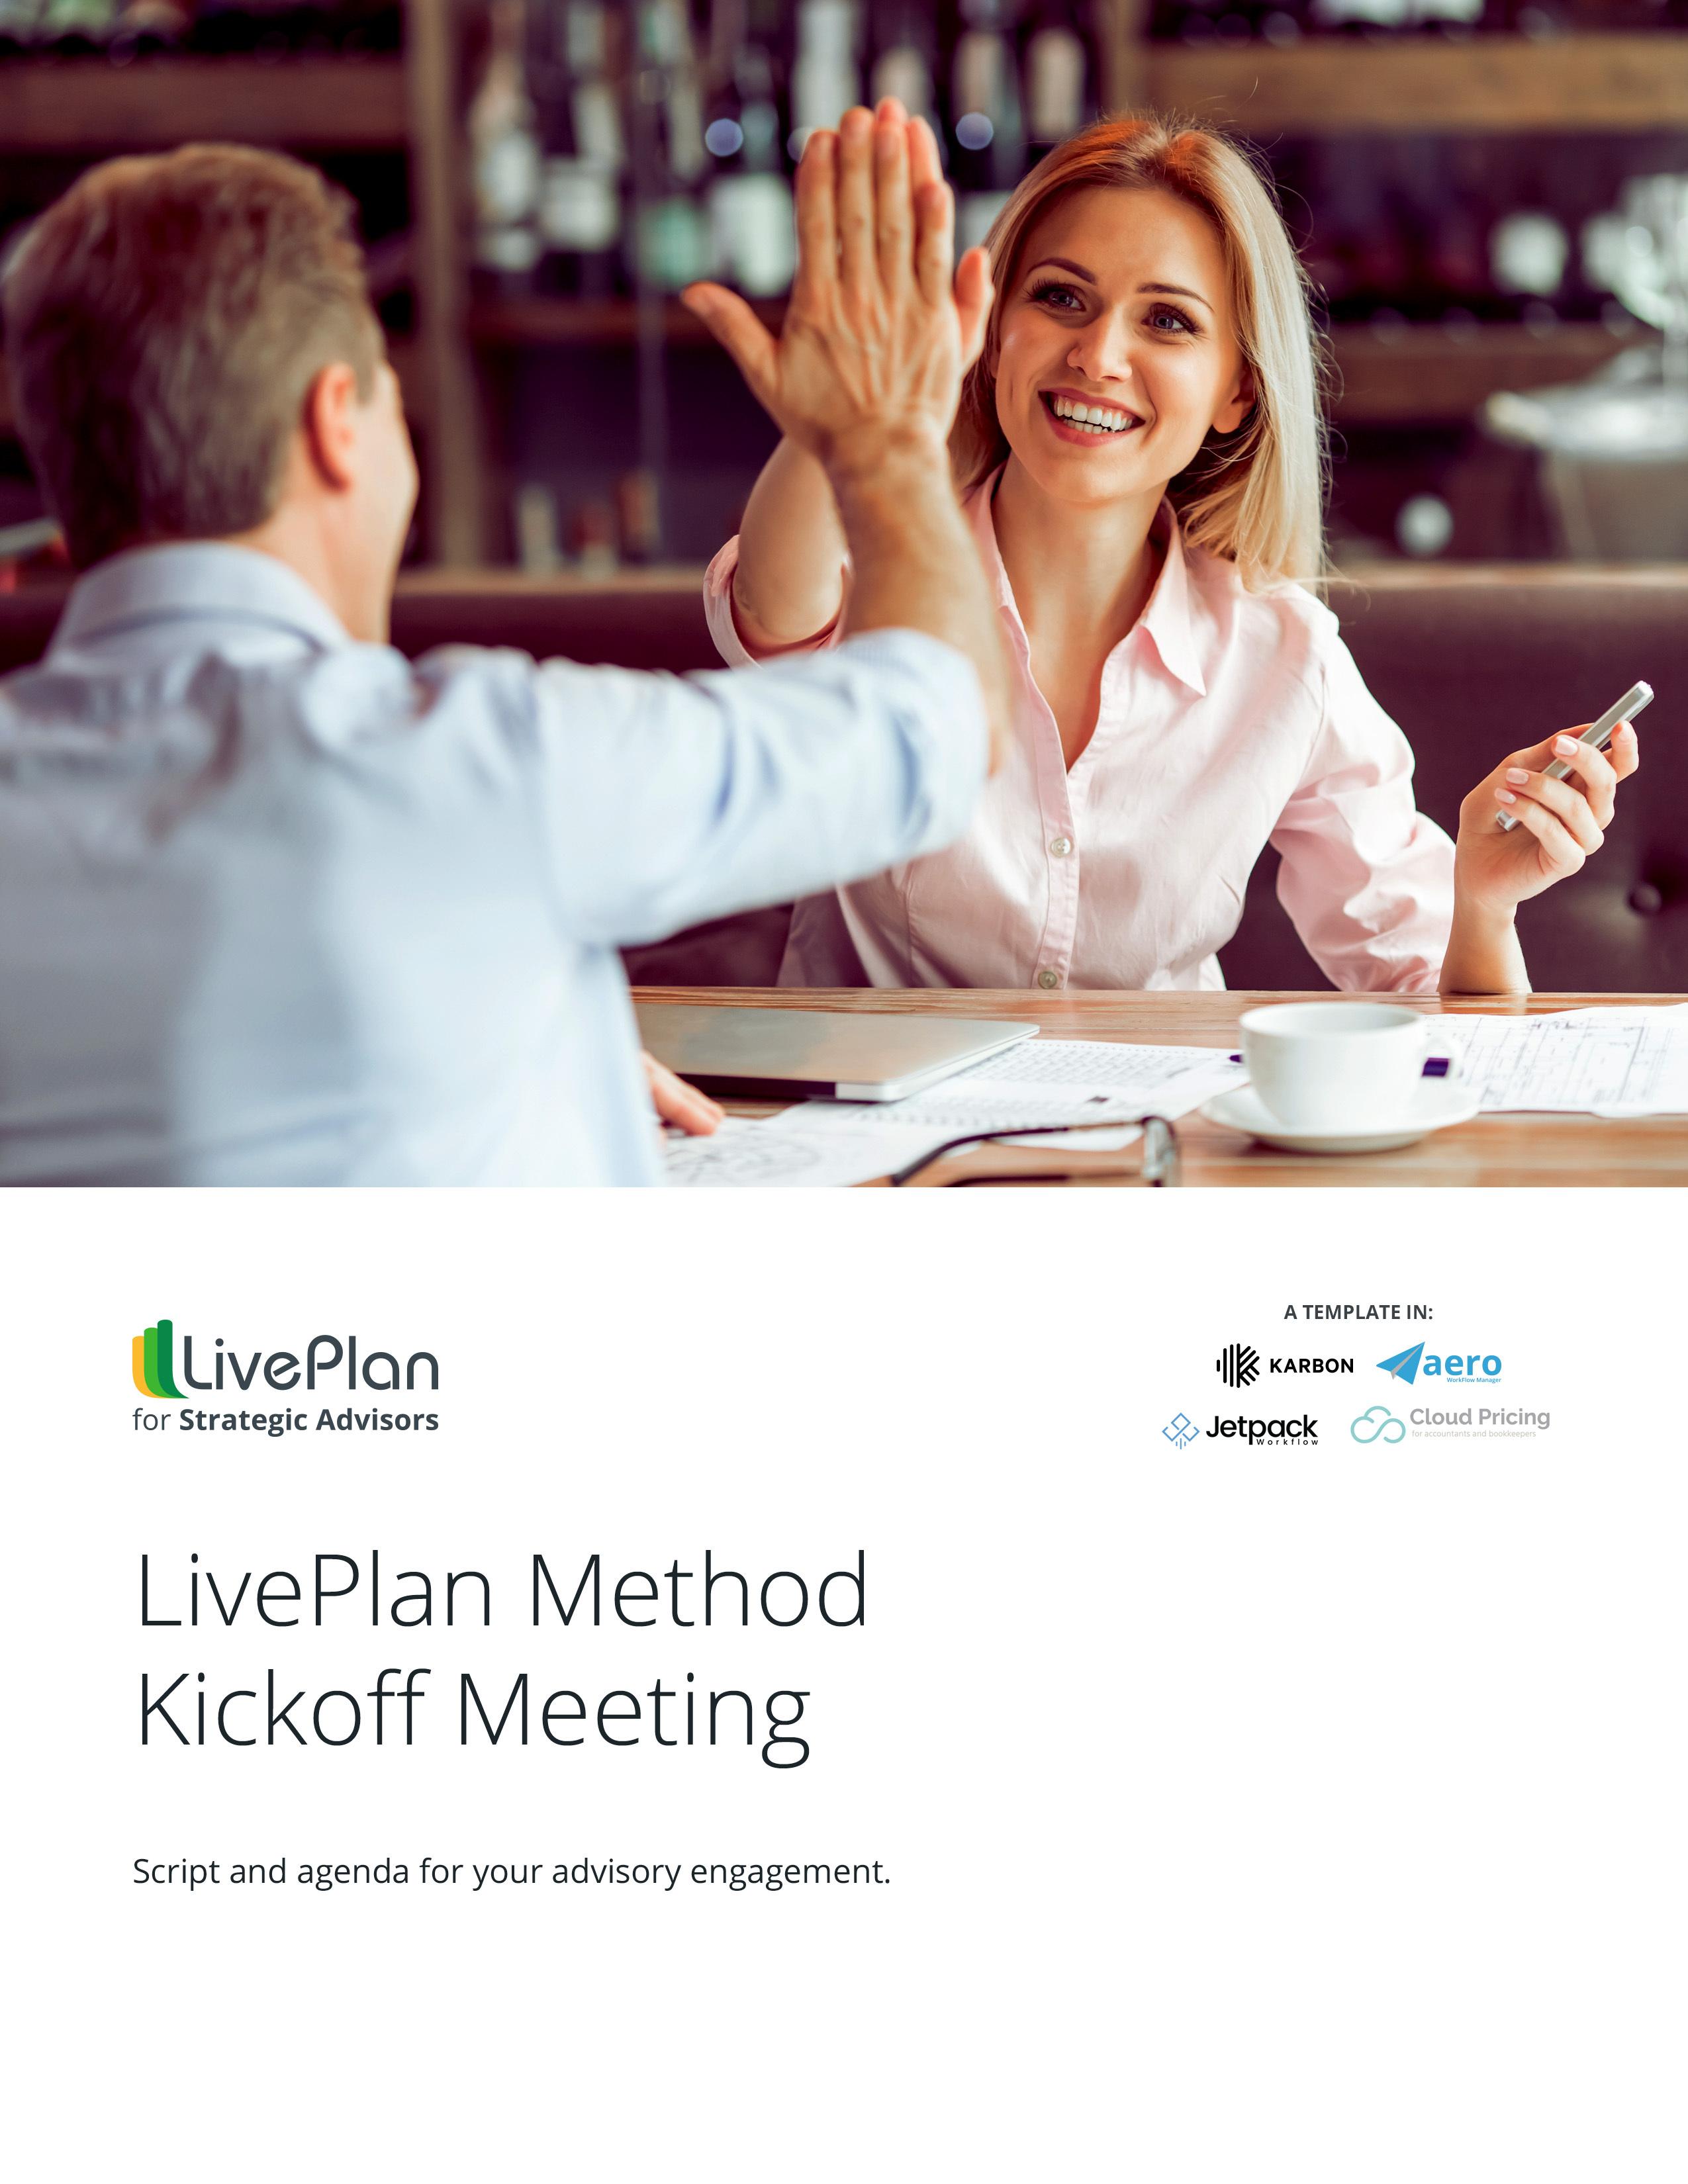 Kickoff meeting cover